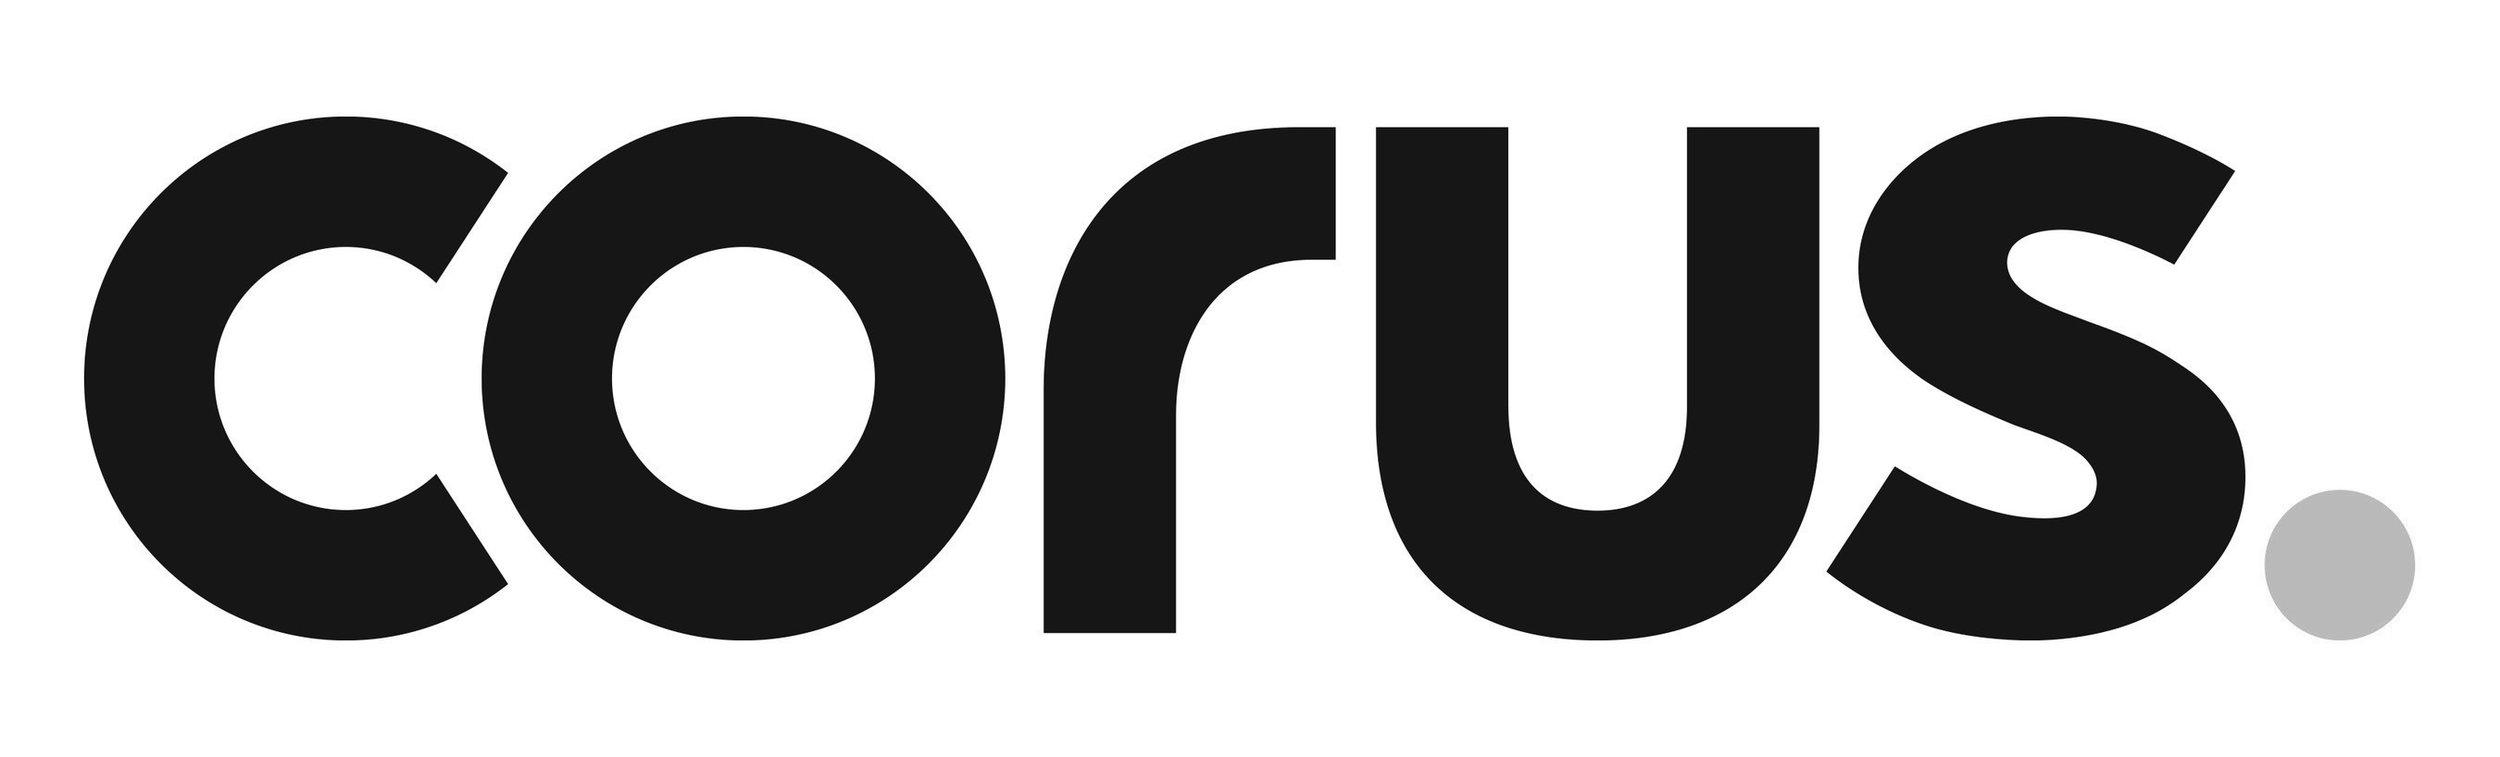 corus logo.jpg